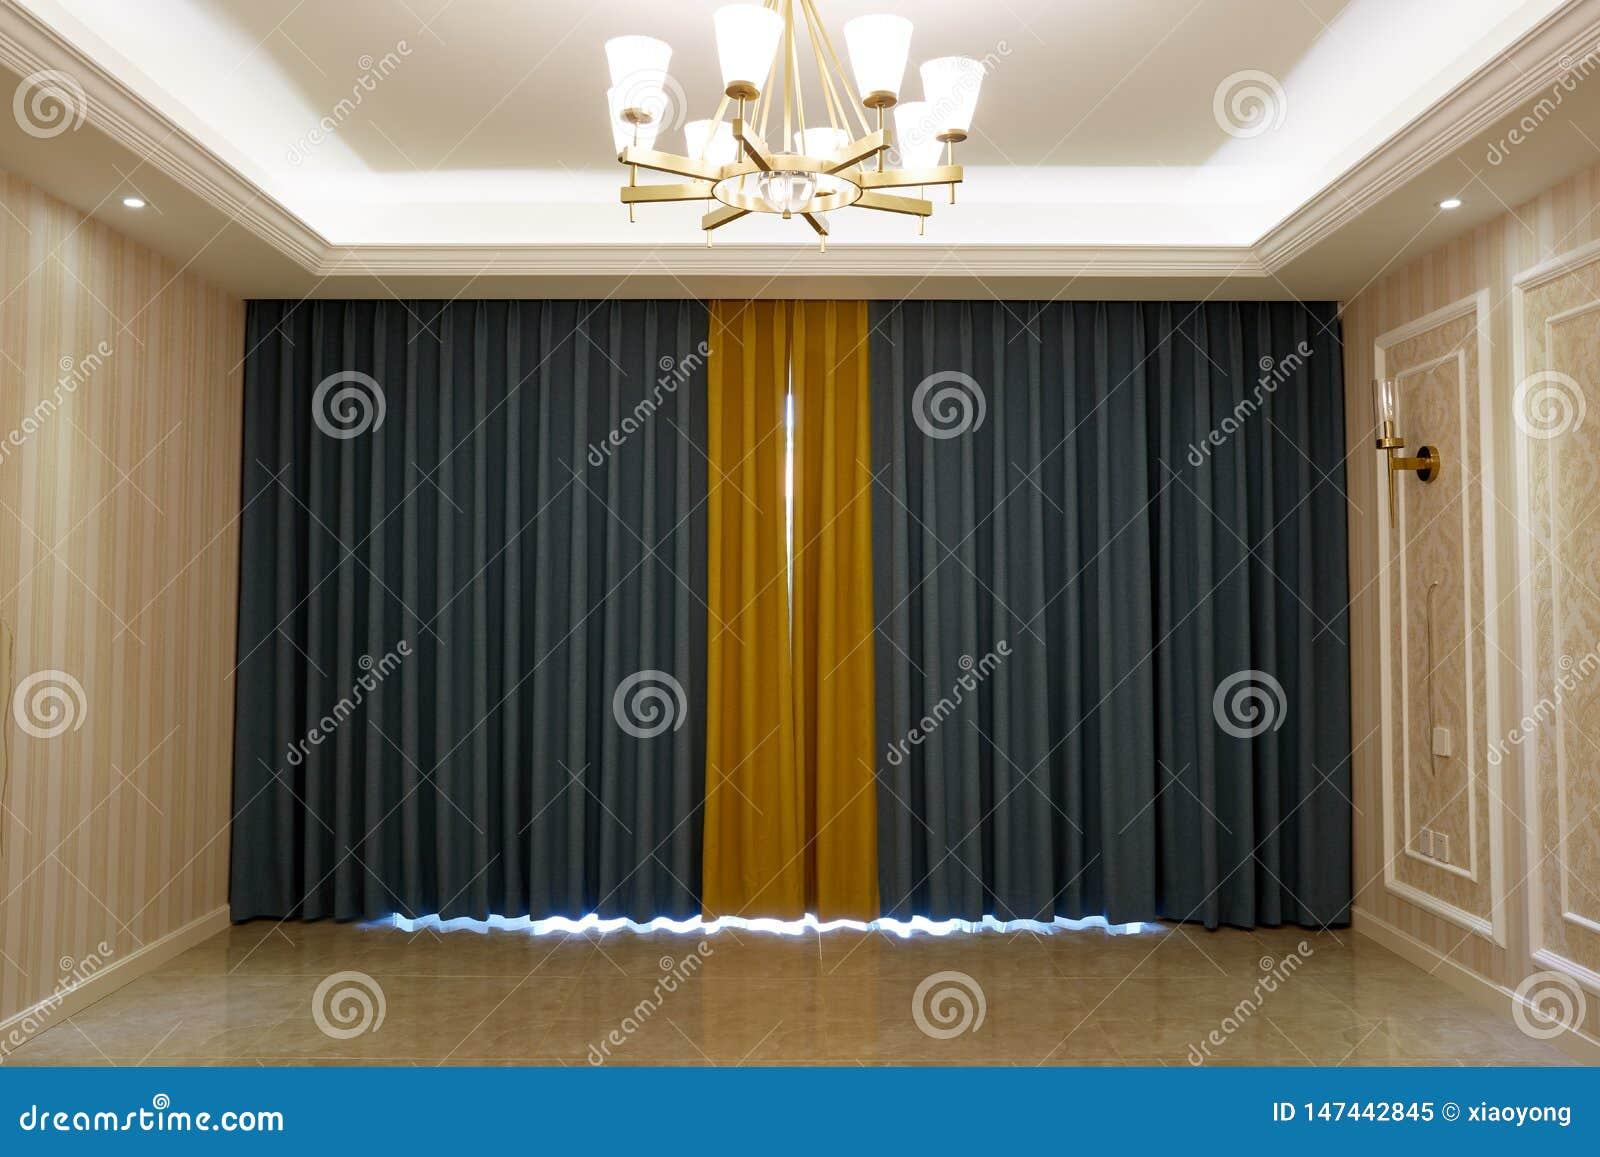 Glory curtain